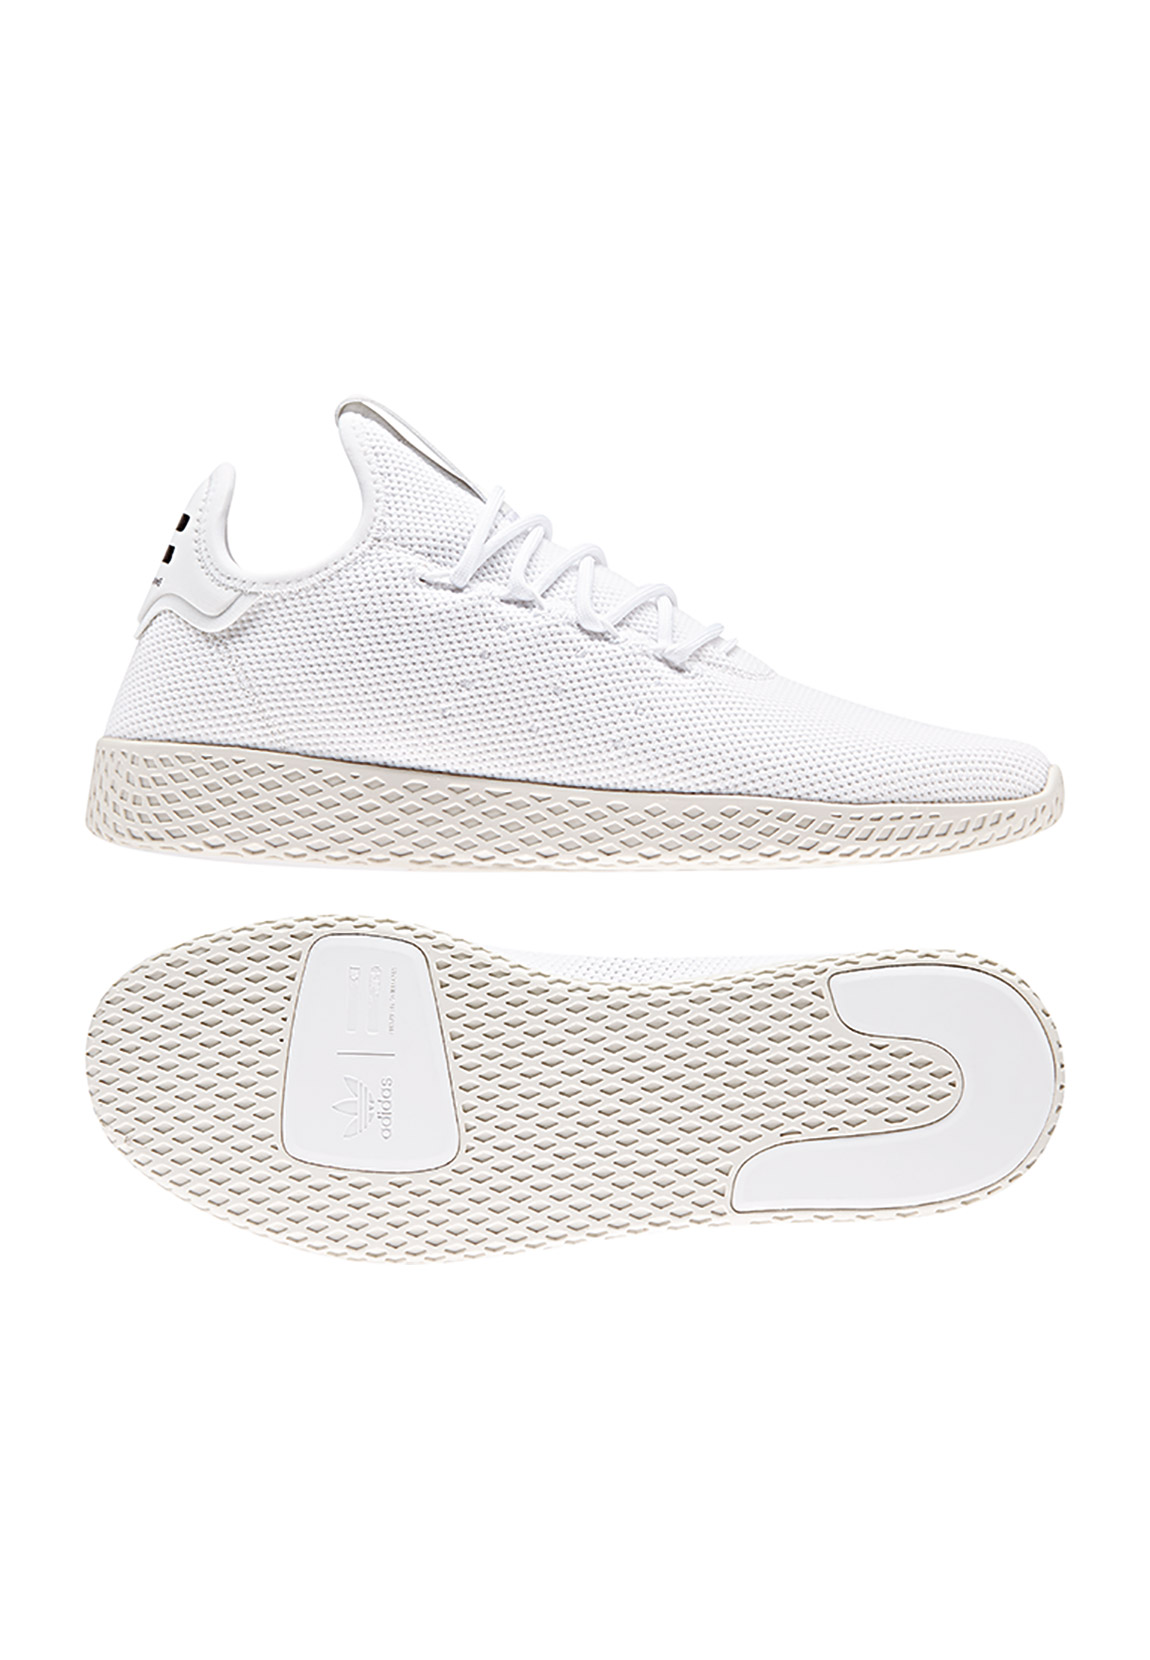 online retailer 1b75f 7e597 Adidas original TENNIS sneaker PW HU B41792 white